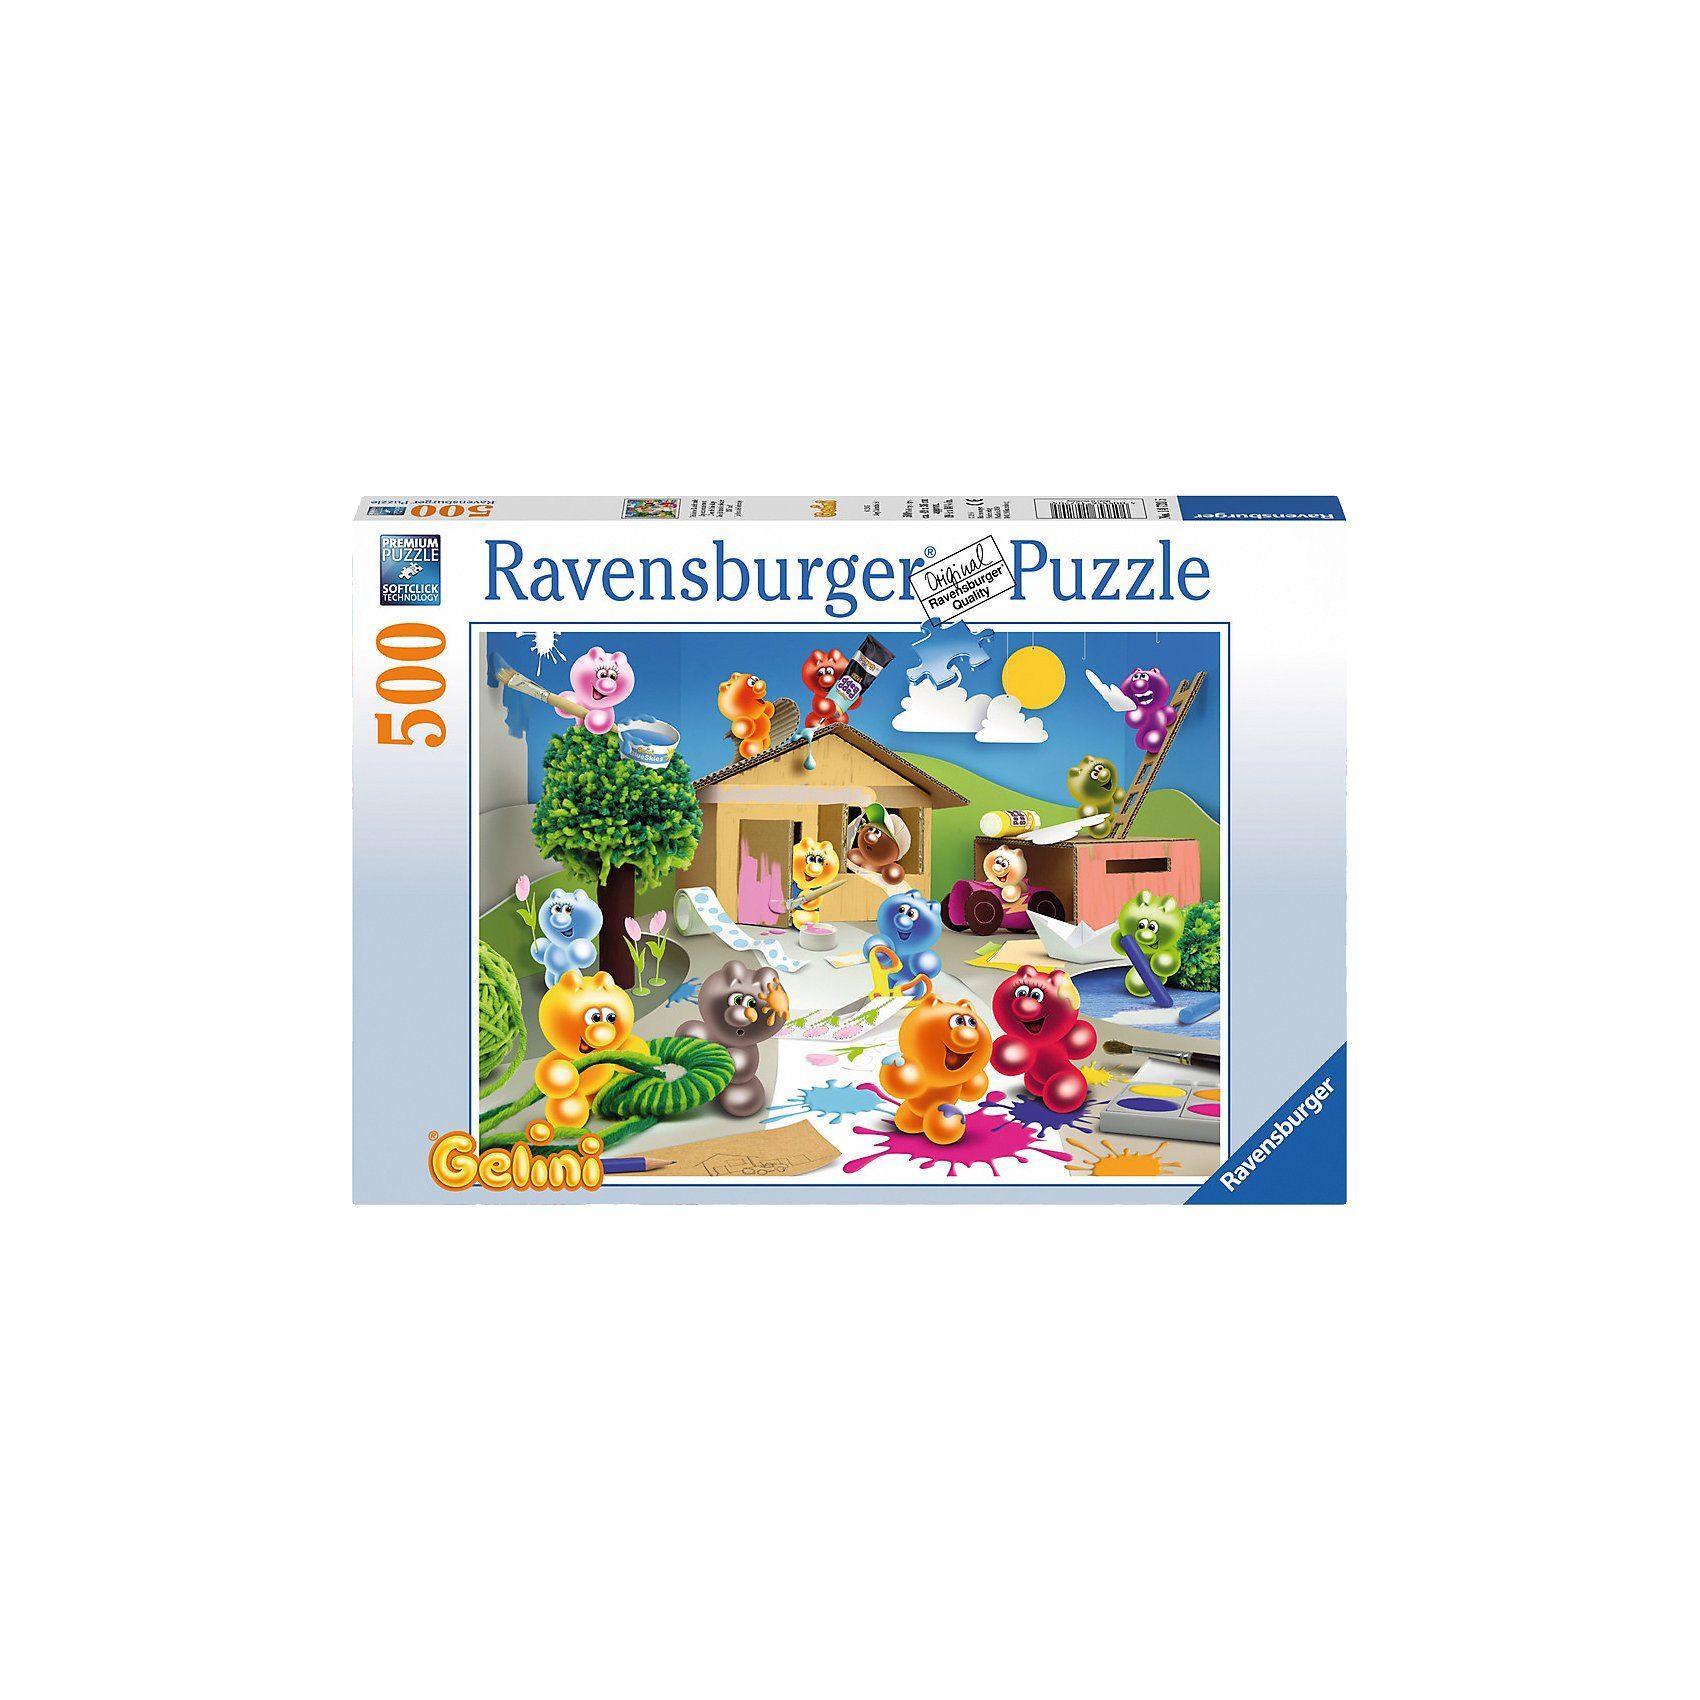 Ravensburger Puzzle 500 Teile Gelini: Fröhliche Bastelrunde